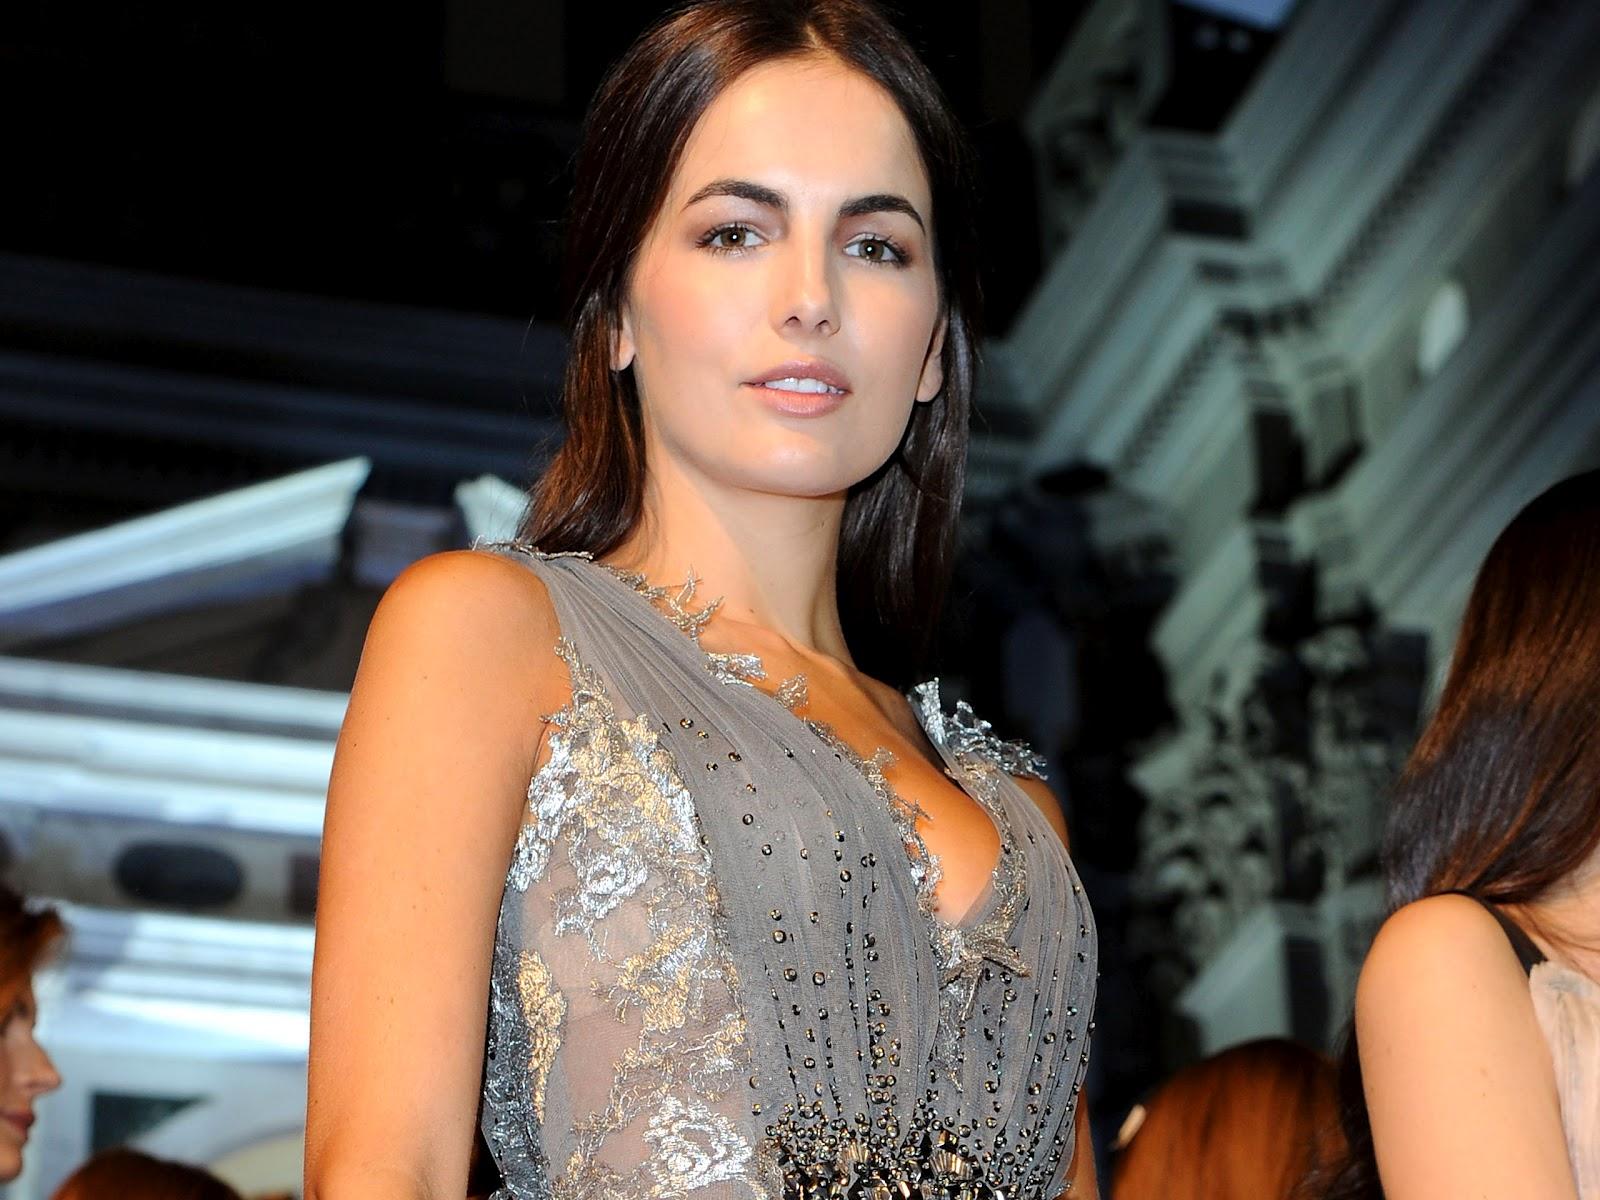 Alessandra Ambrosio Hd Wallpaper Camilla Belle New Hd Wallpapers 2012 Hot Celebrity Emma